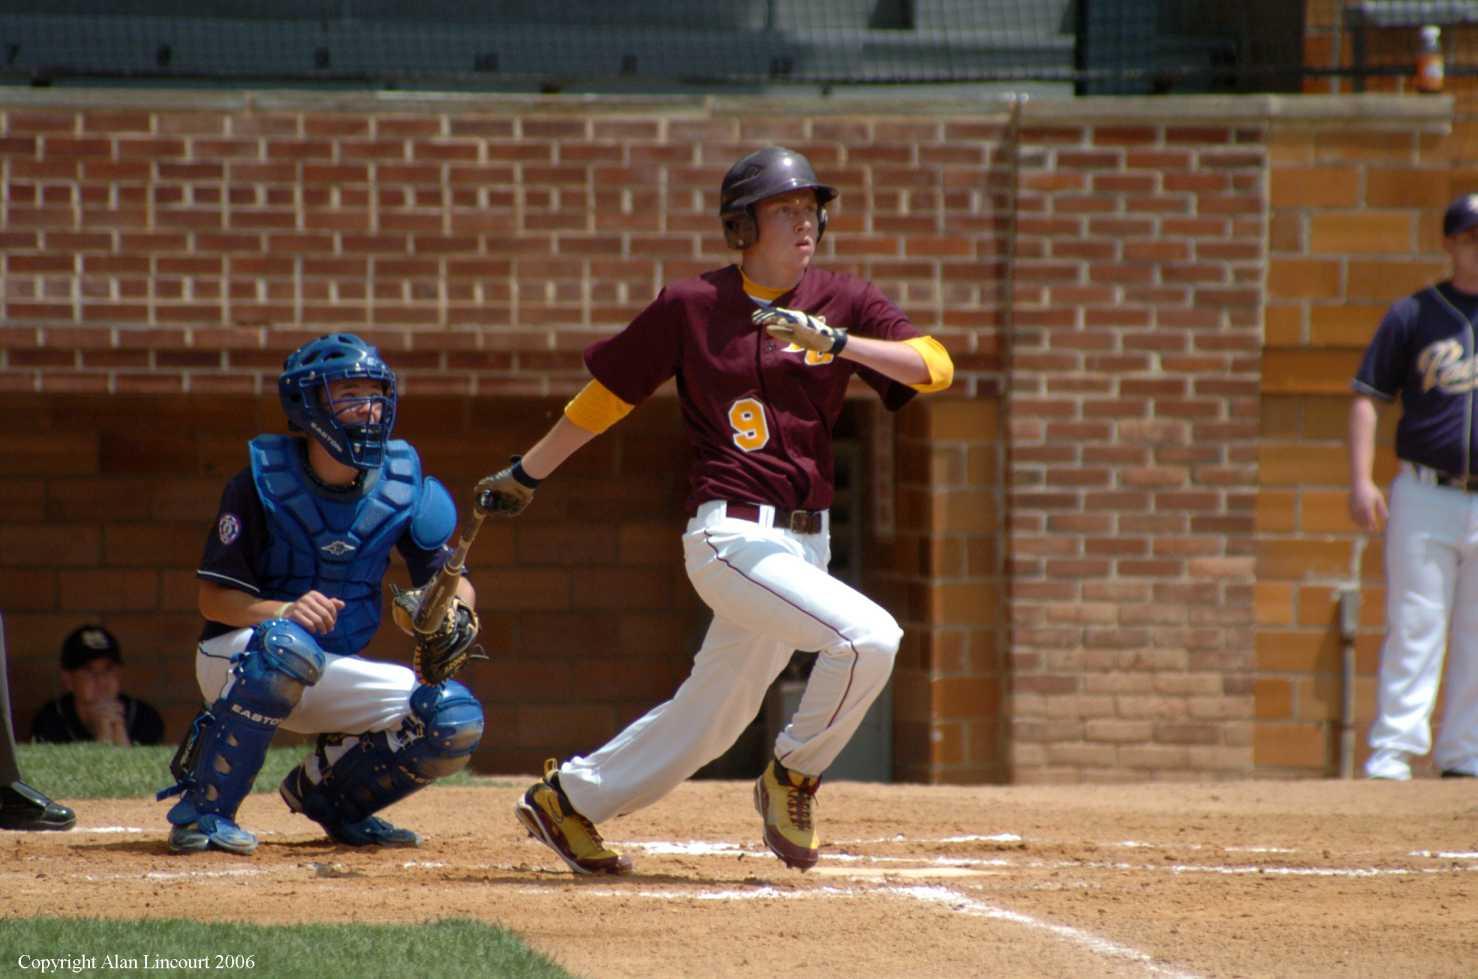 Lincourt catcher batter after swing